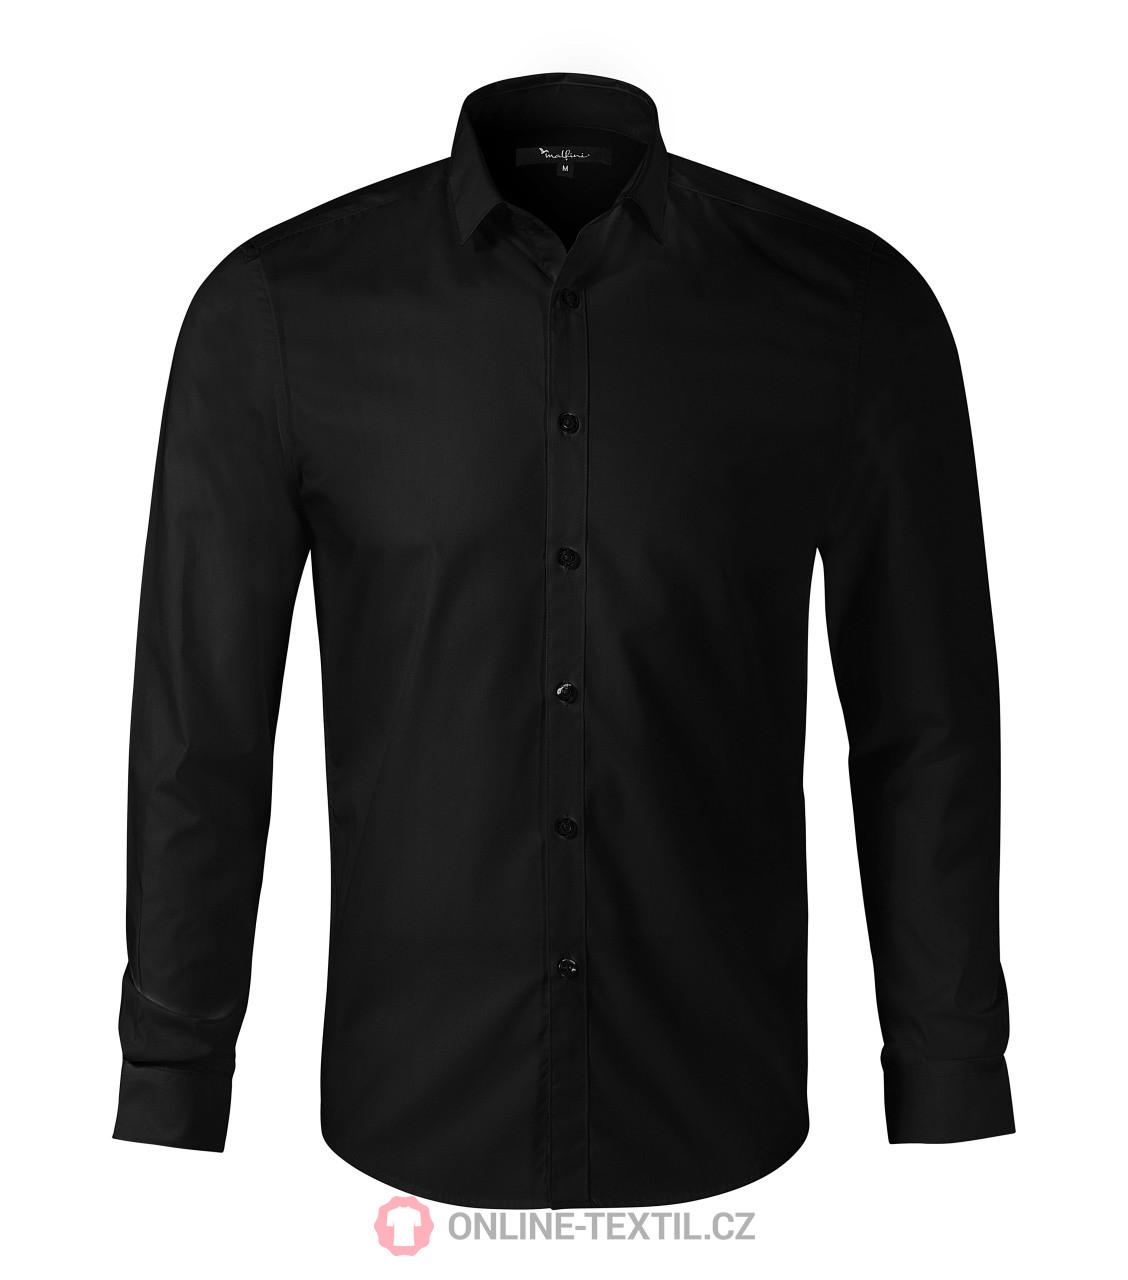 Pánská košile Malfini Premium Dynamic  Pánská košile Malfini Premium Dynamic  ... 5cbc5c12e7